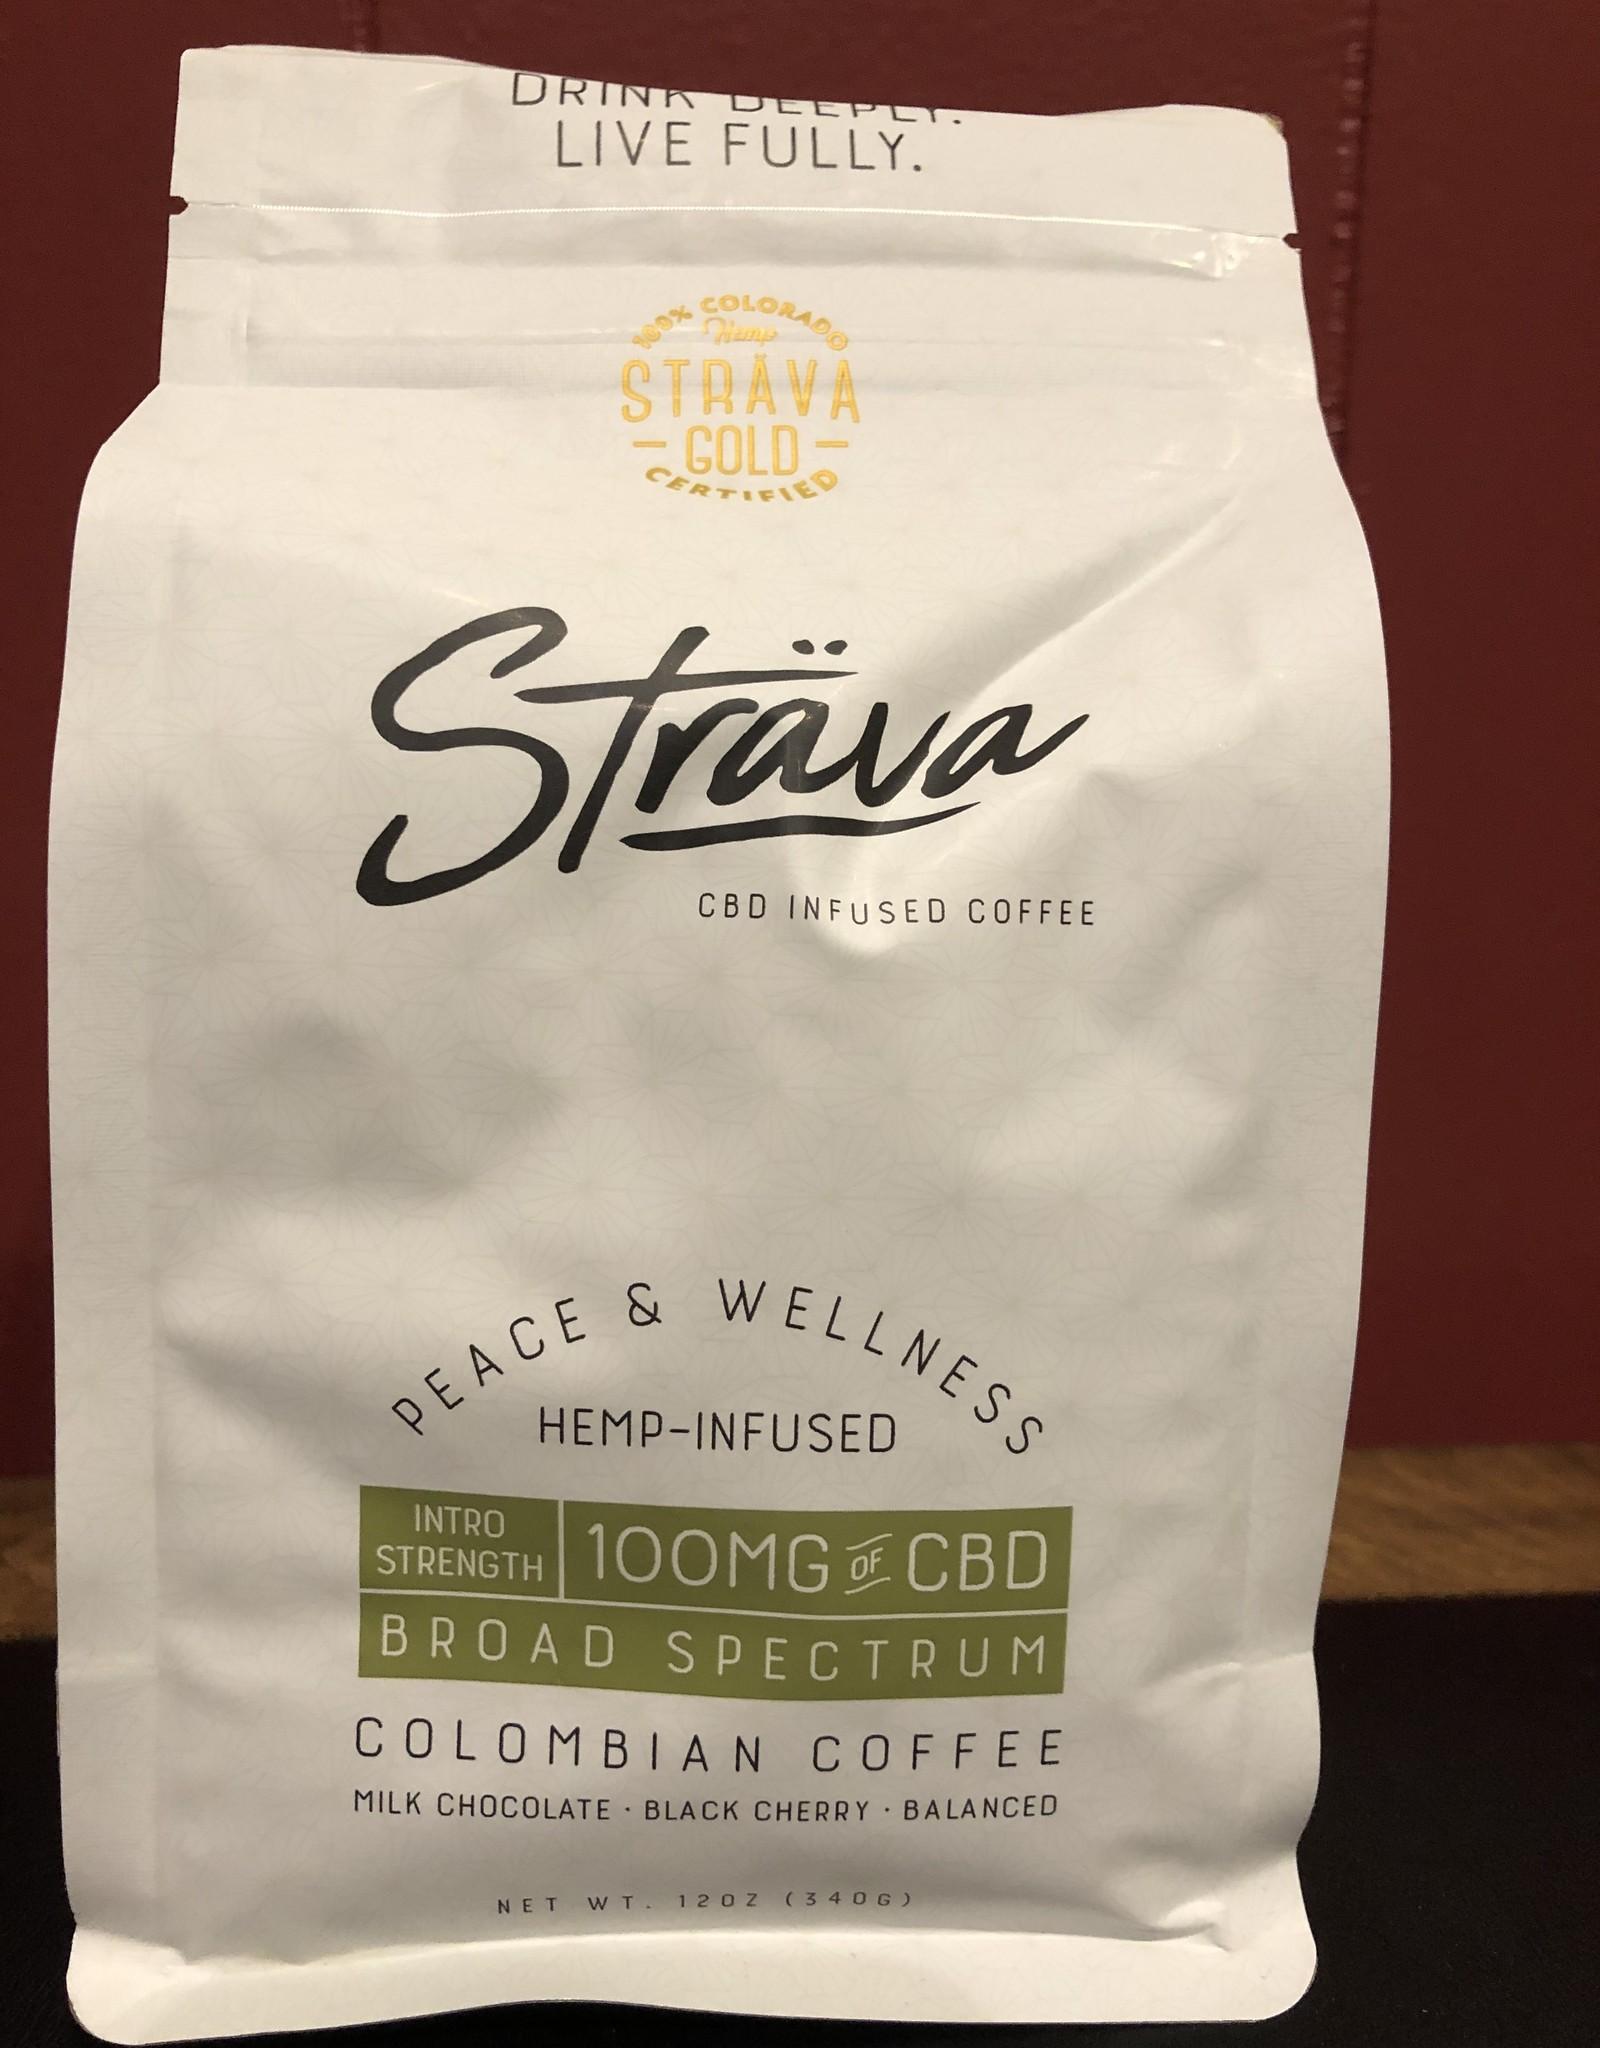 Strava Hemp Infused Coffee - Intro Strength 100mg/bag, 4mg/serving